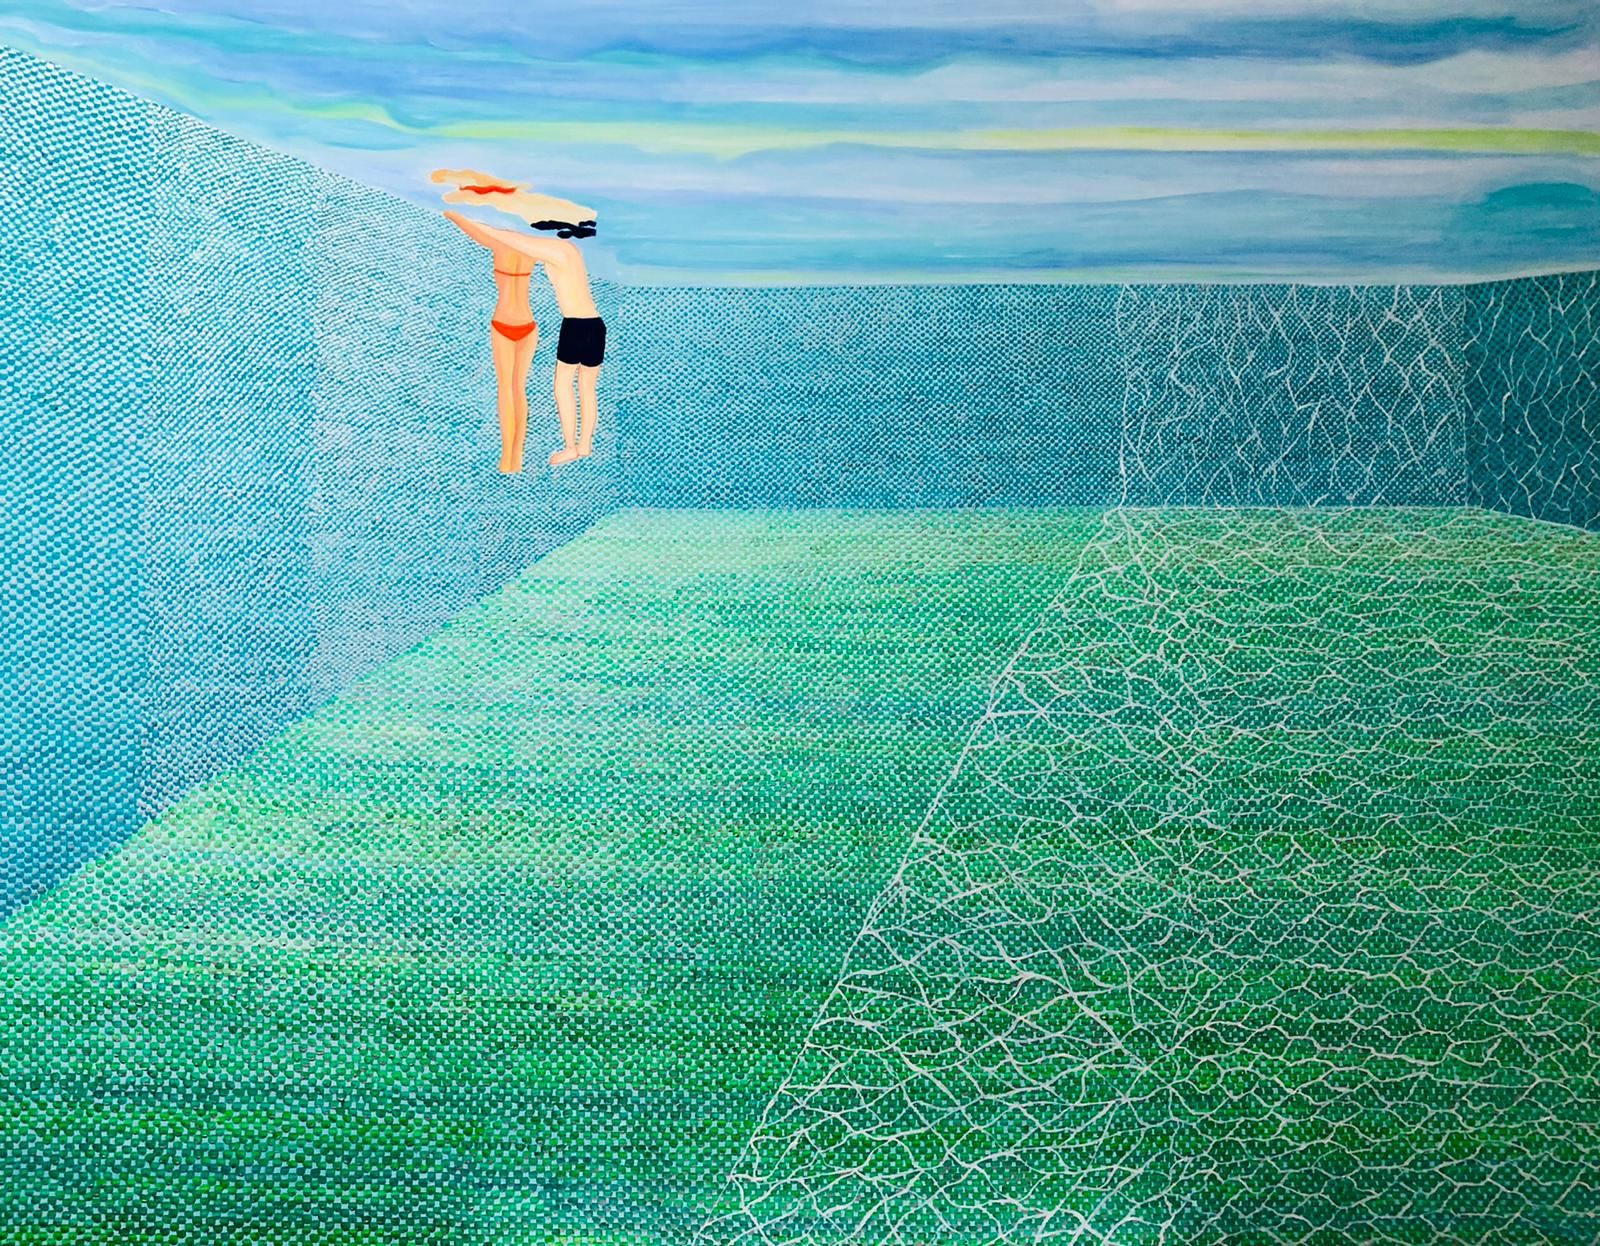 Unis-Vert – Universe (2020) by Aude Gooly